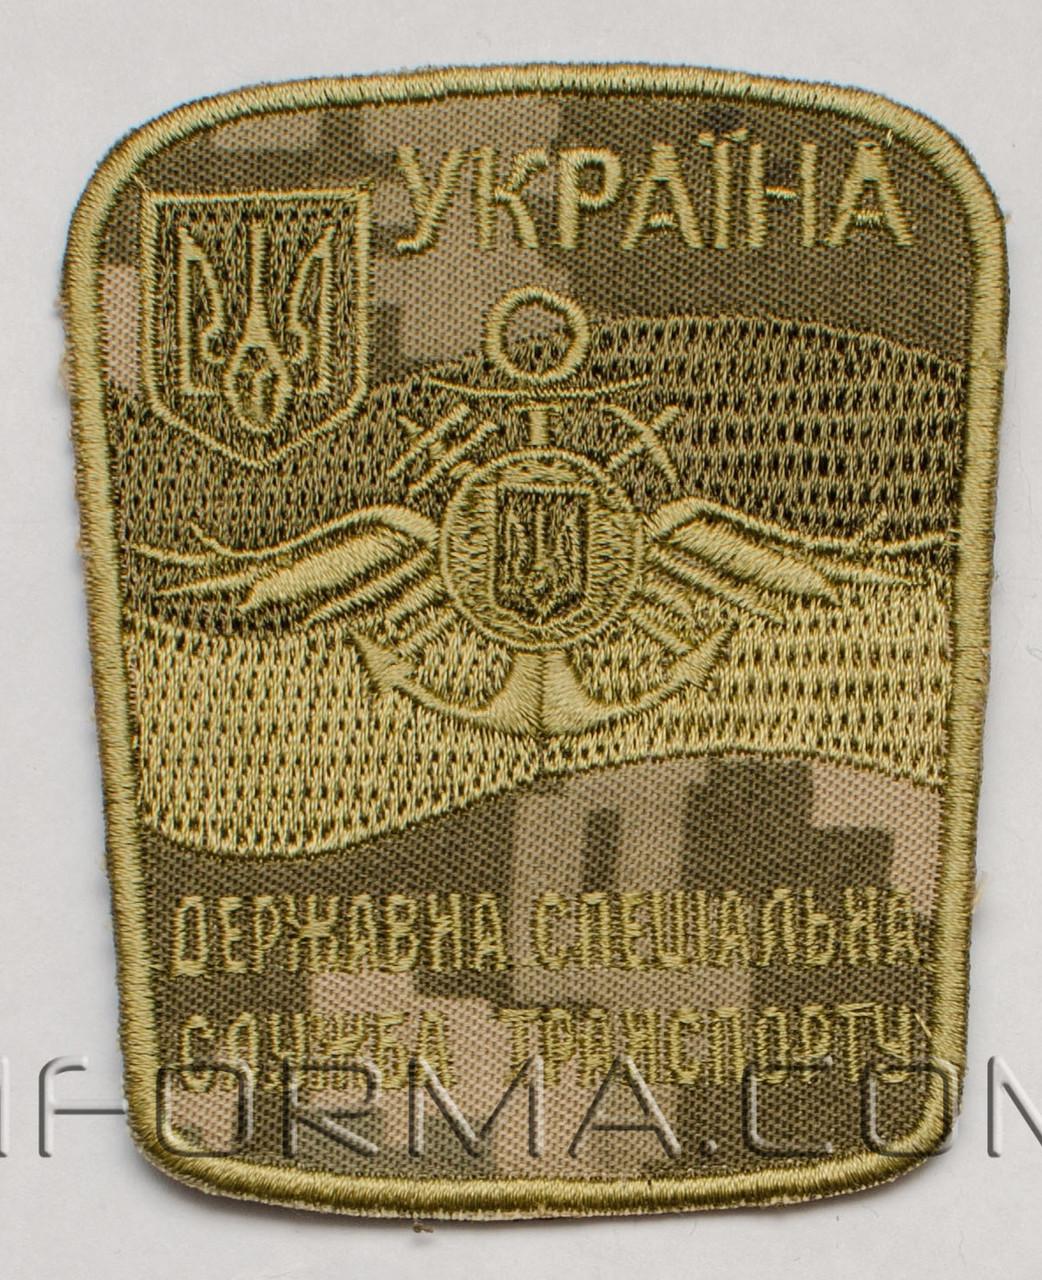 Шеврон Калинка ДССТ пиксель ЗСУ